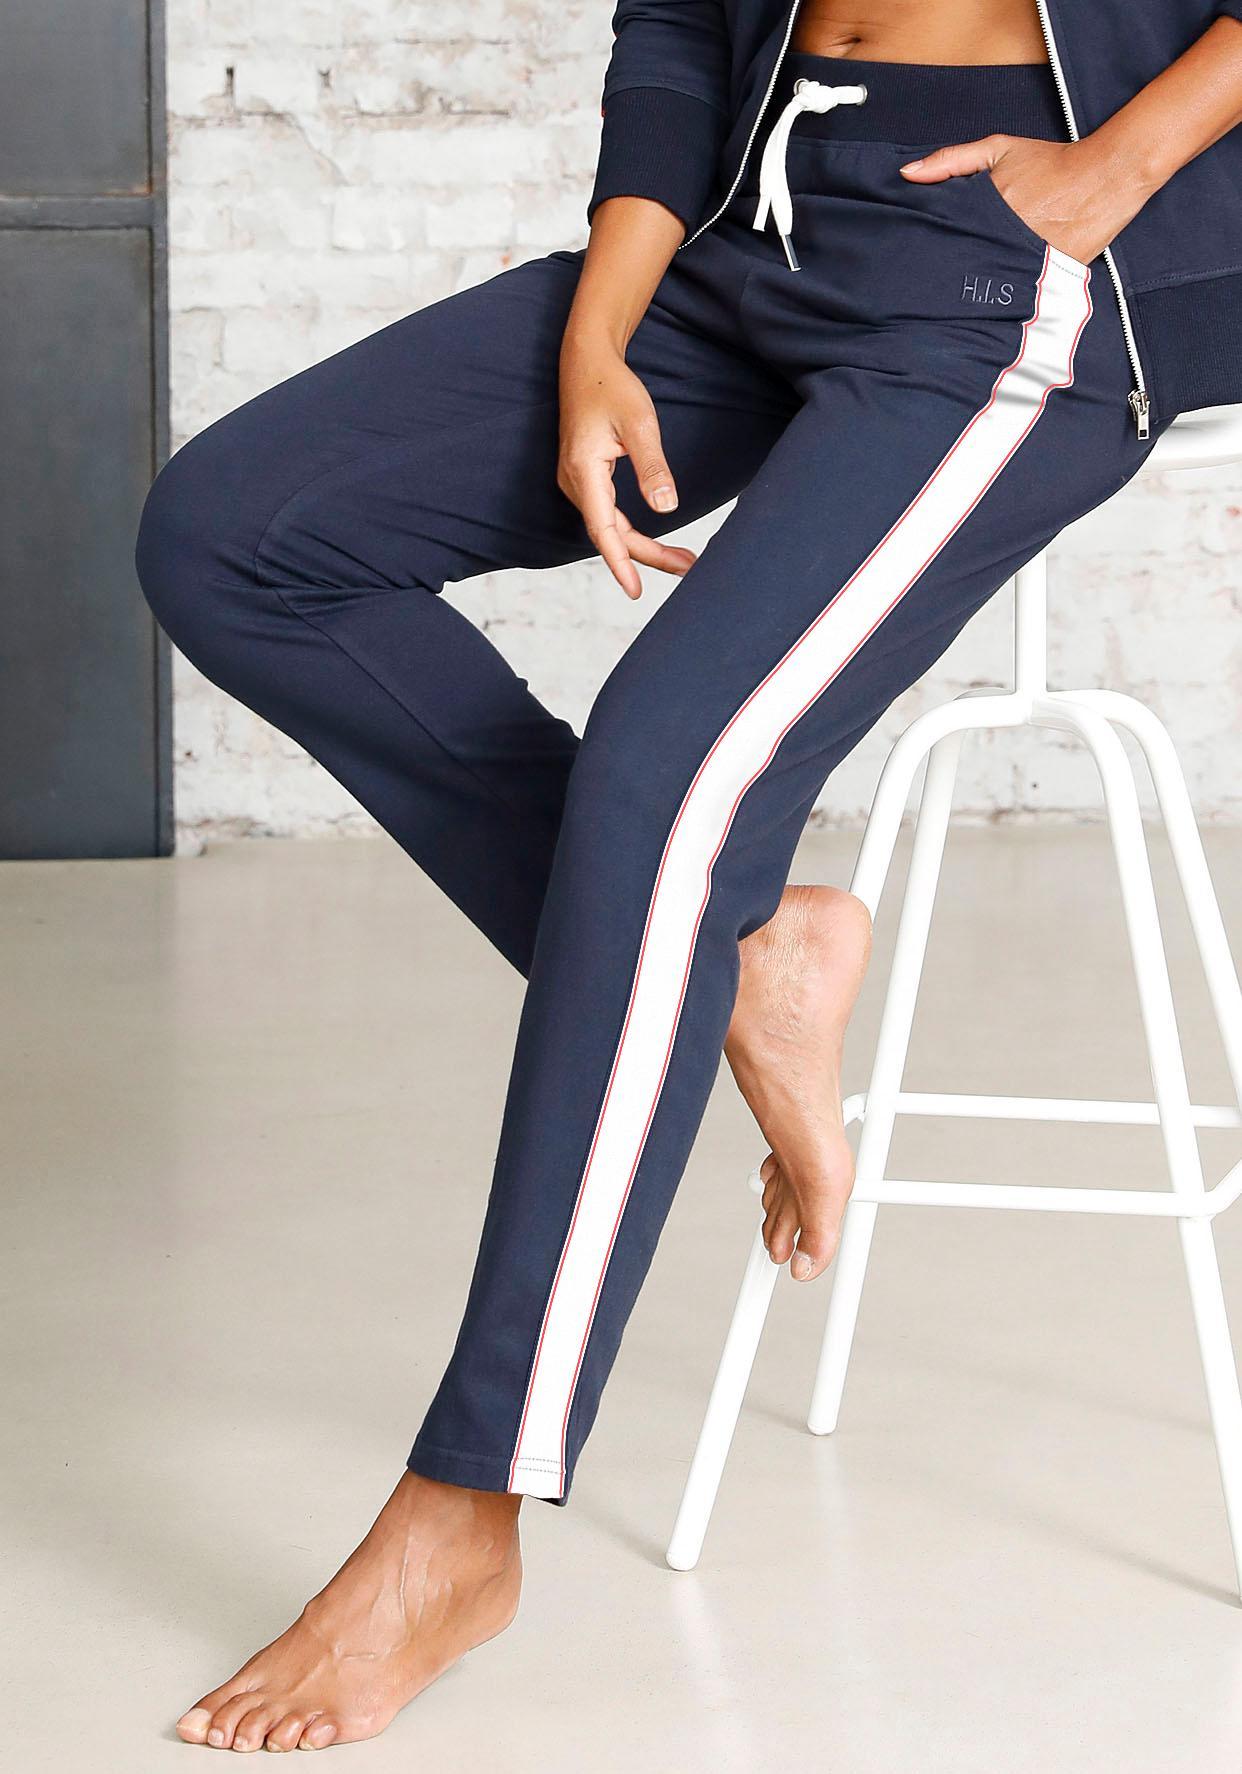 HIS Relaxhose | Bekleidung > Homewear > Relaxhosen | H.I.S